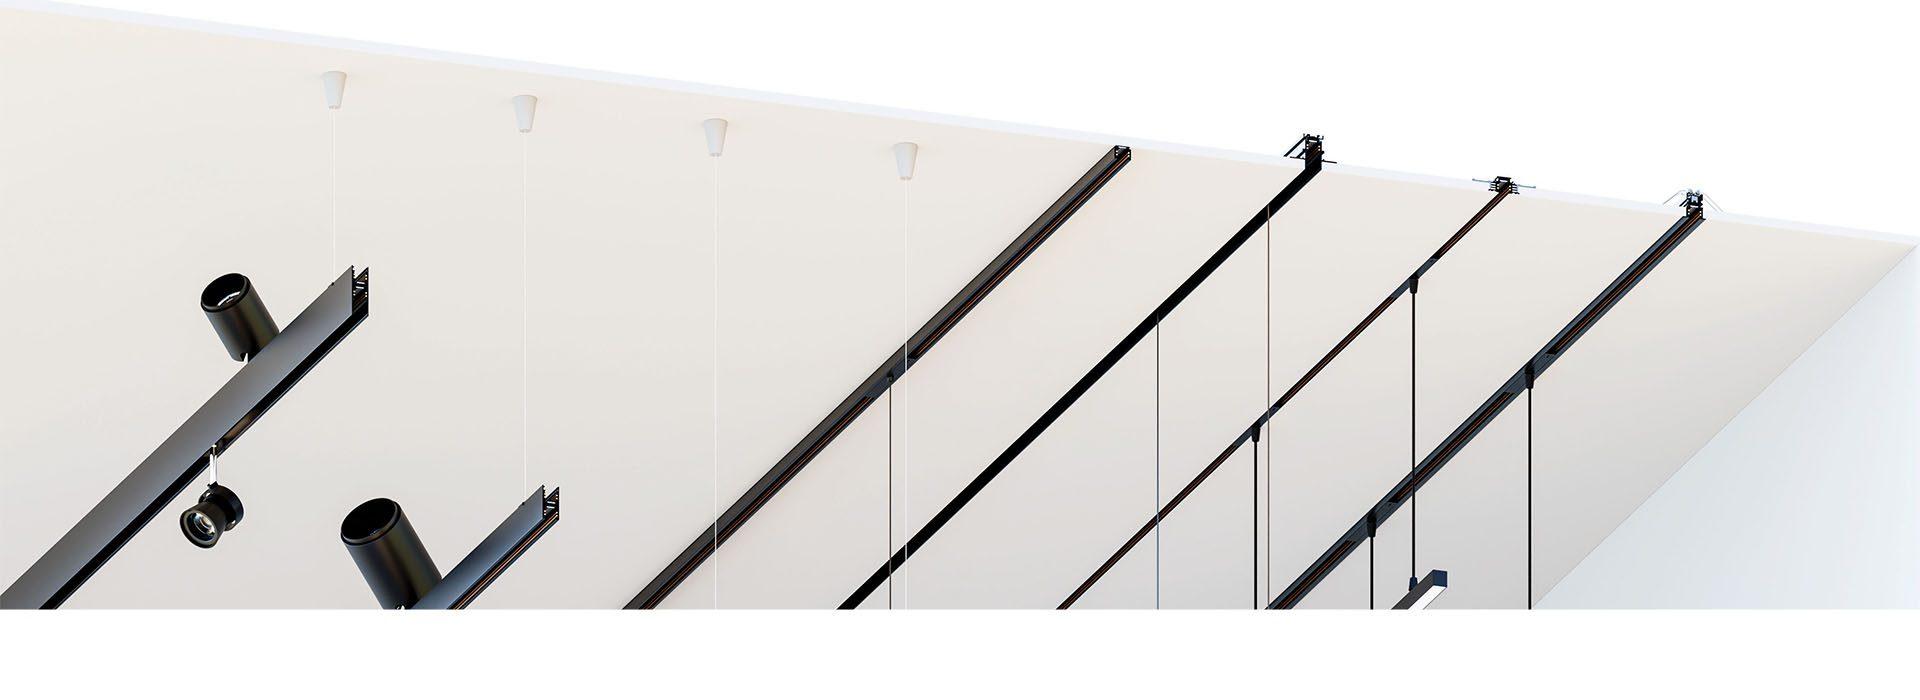 formalighting architectural lighting